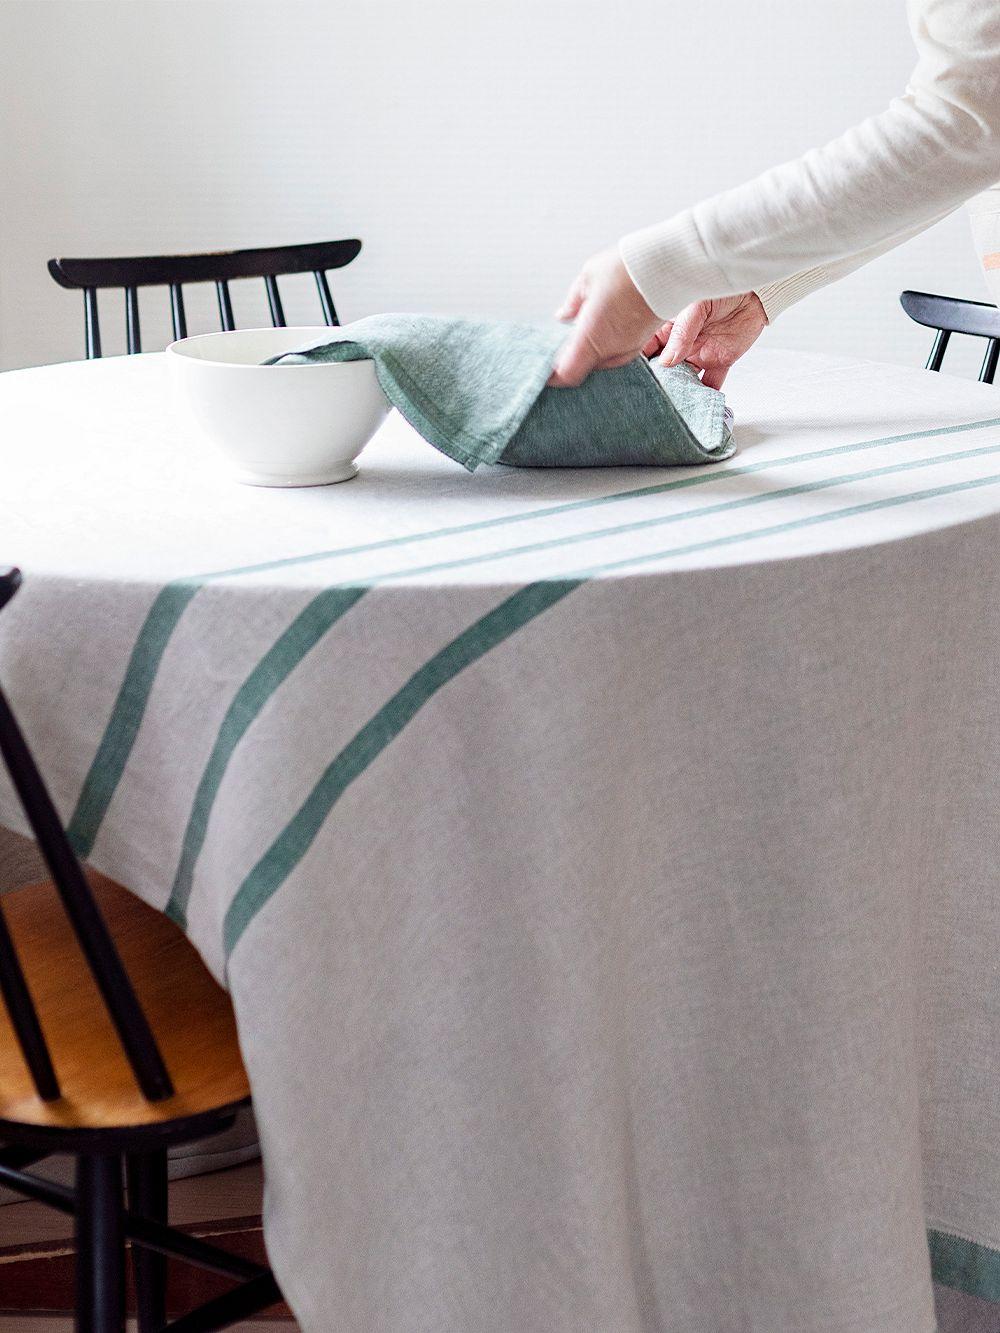 Lapuan Kankurit Usva tablecloth, linen - aspen green